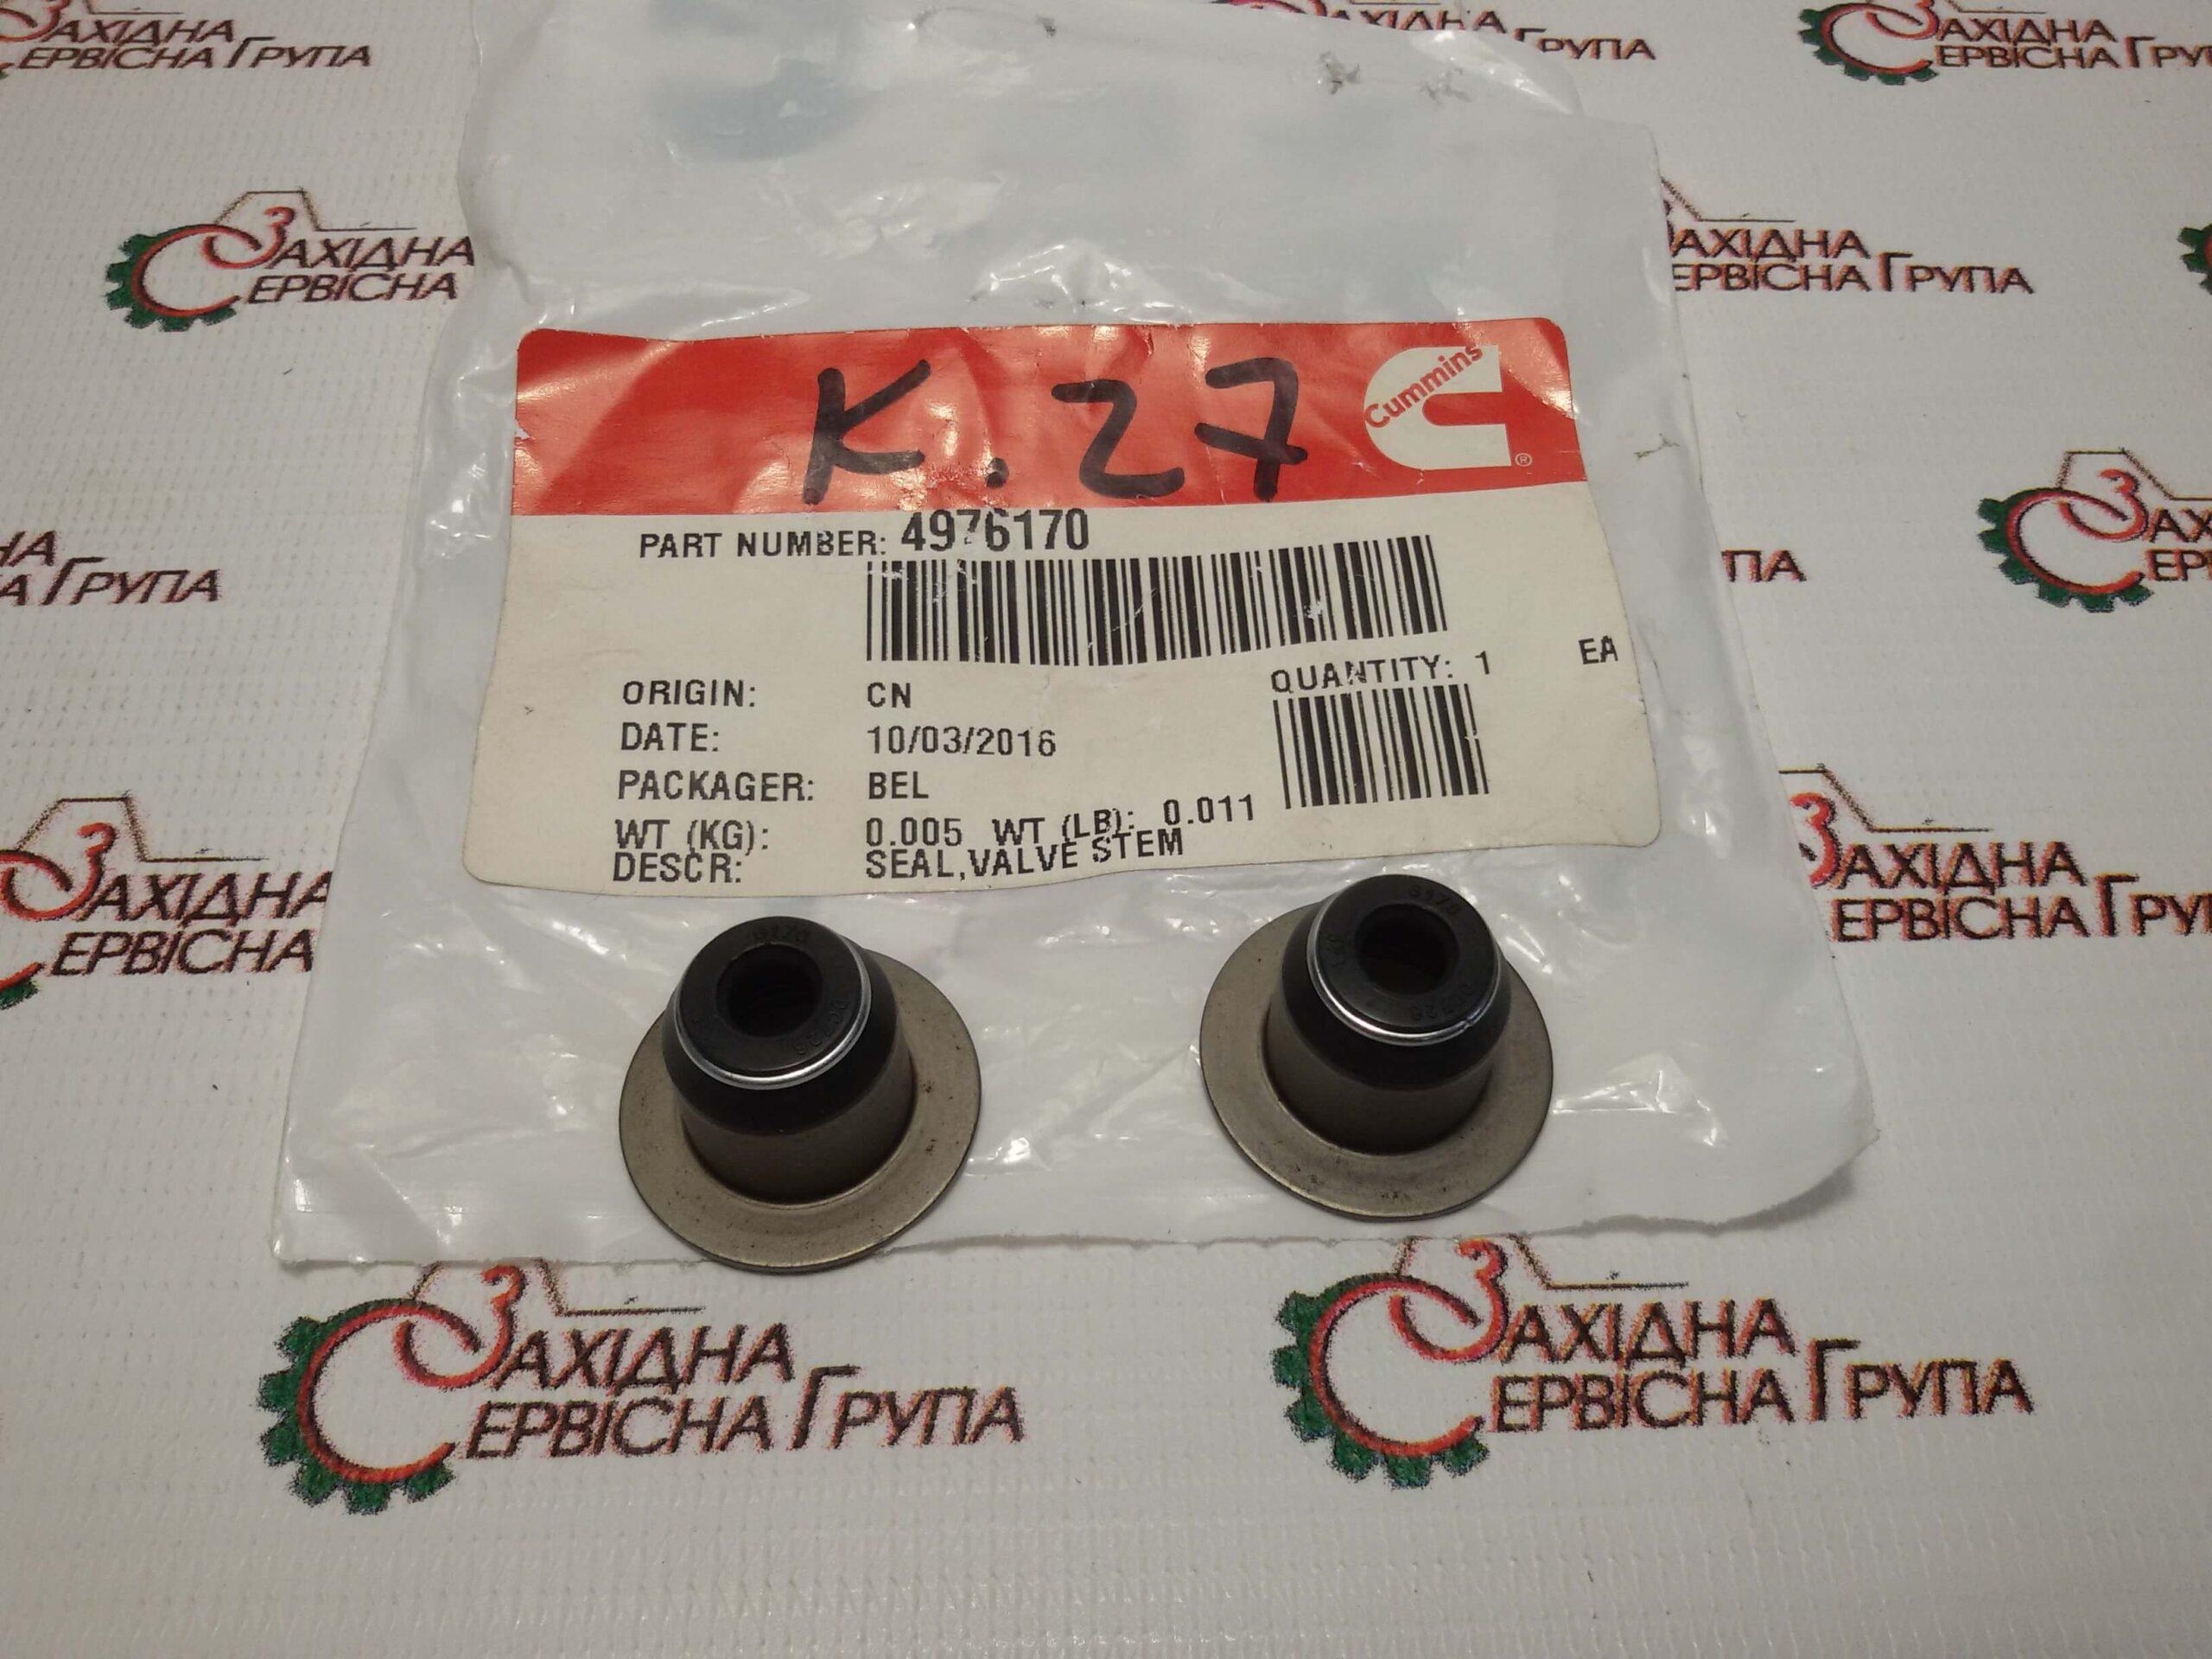 Сальник клапана Cummins ISF 2.8, 4976170, 5338751.